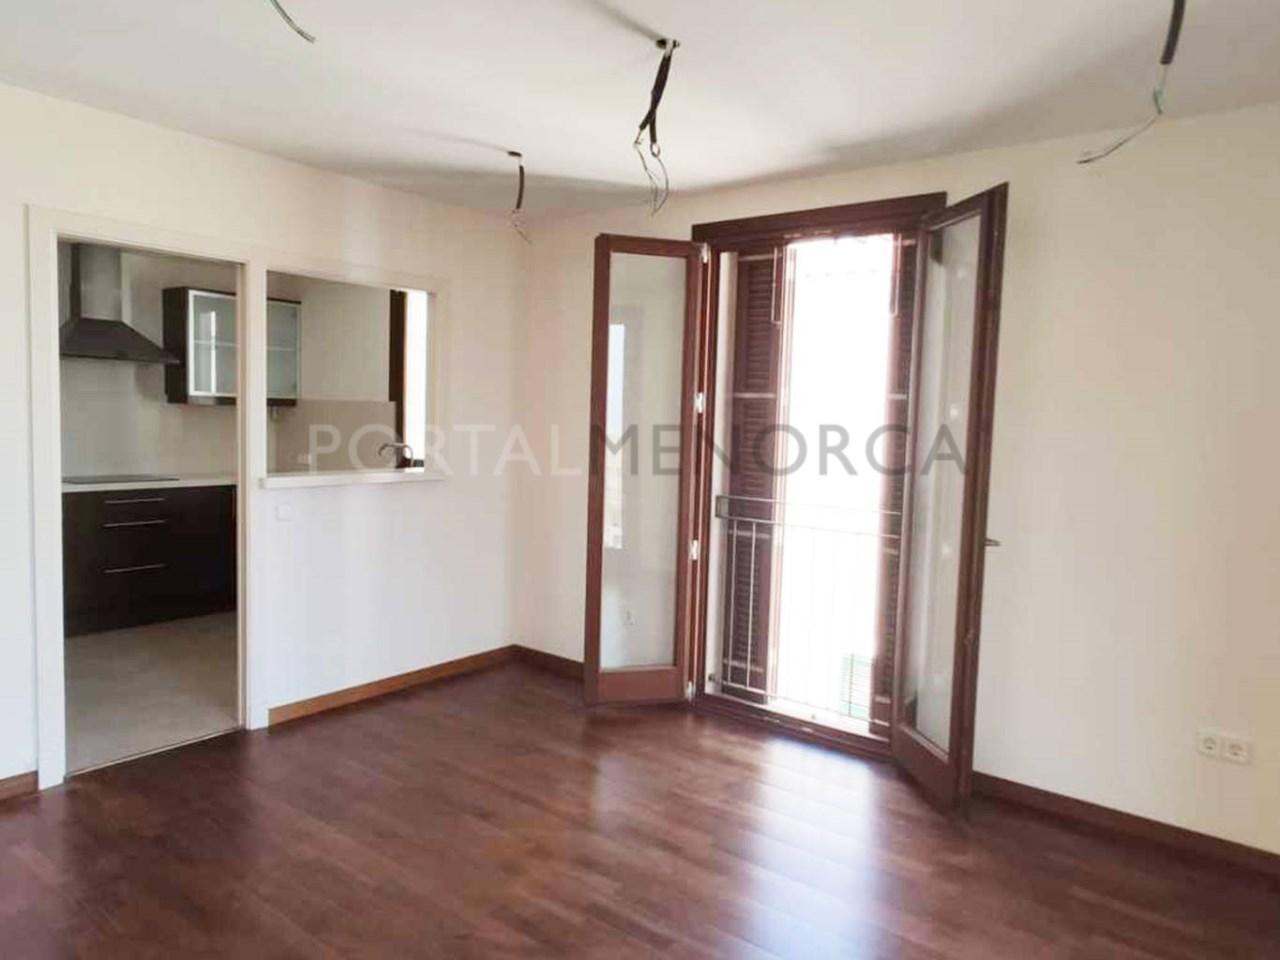 Apartment in the center of Ciutadella _living room